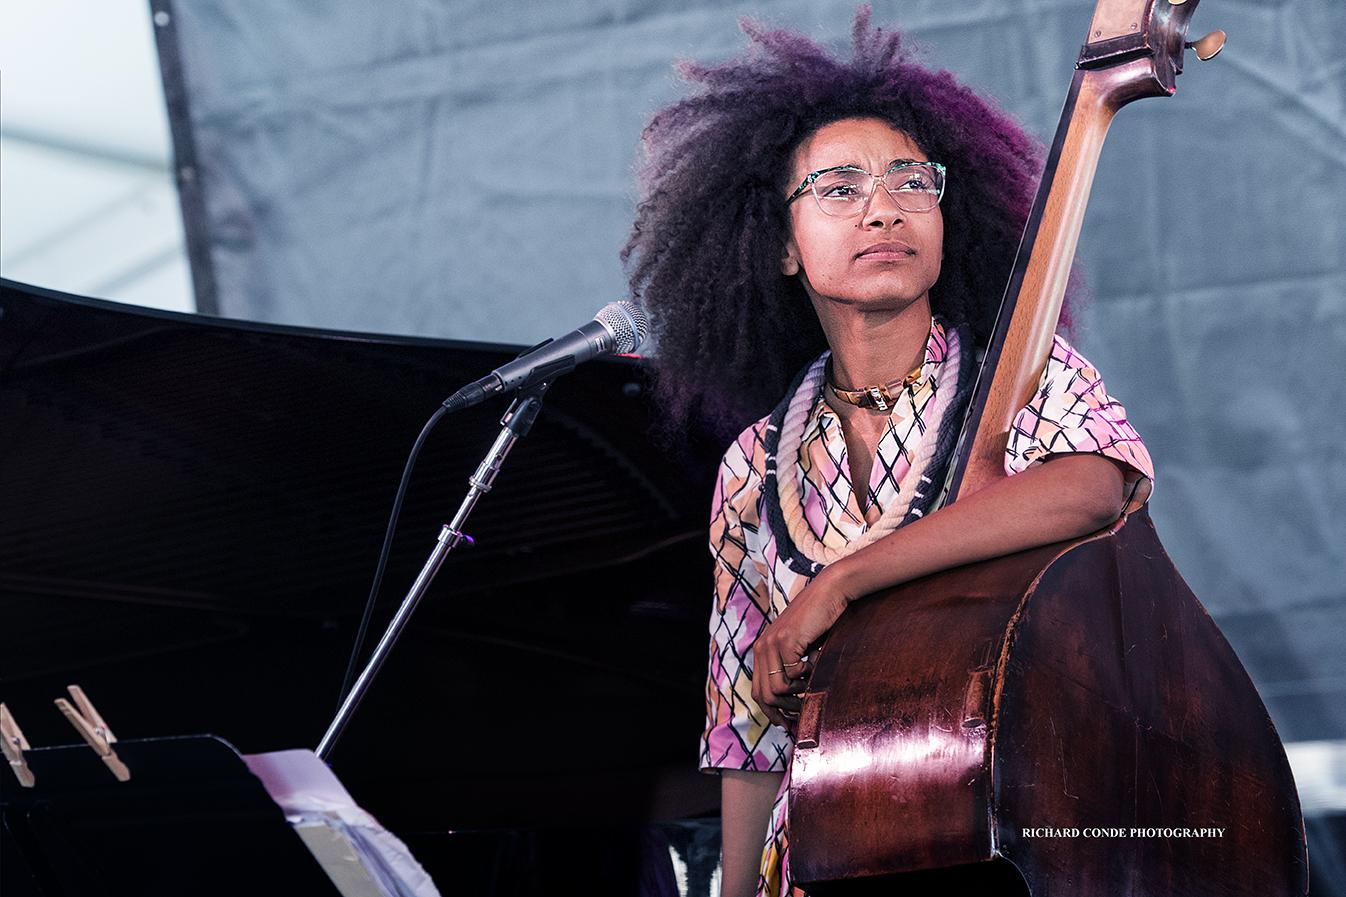 Esperanza Splading at the 2017 Newport Jazz Festival